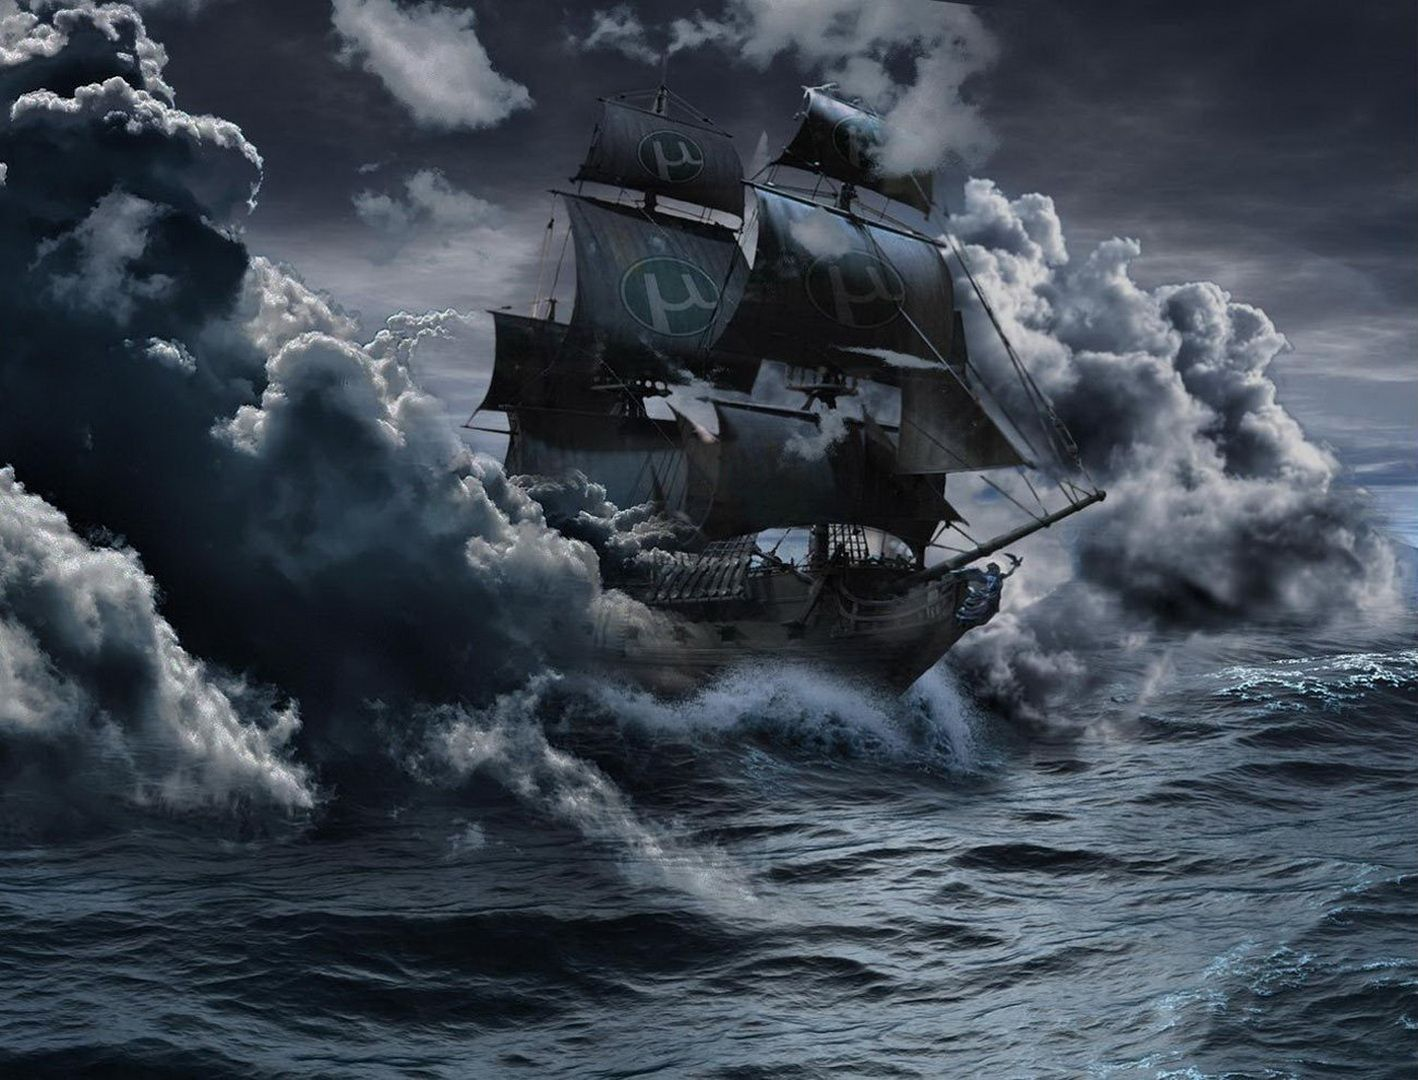 Fantasy ship cliff jolly roger pirate ship rock lightning wallpaper - Pirate Ship